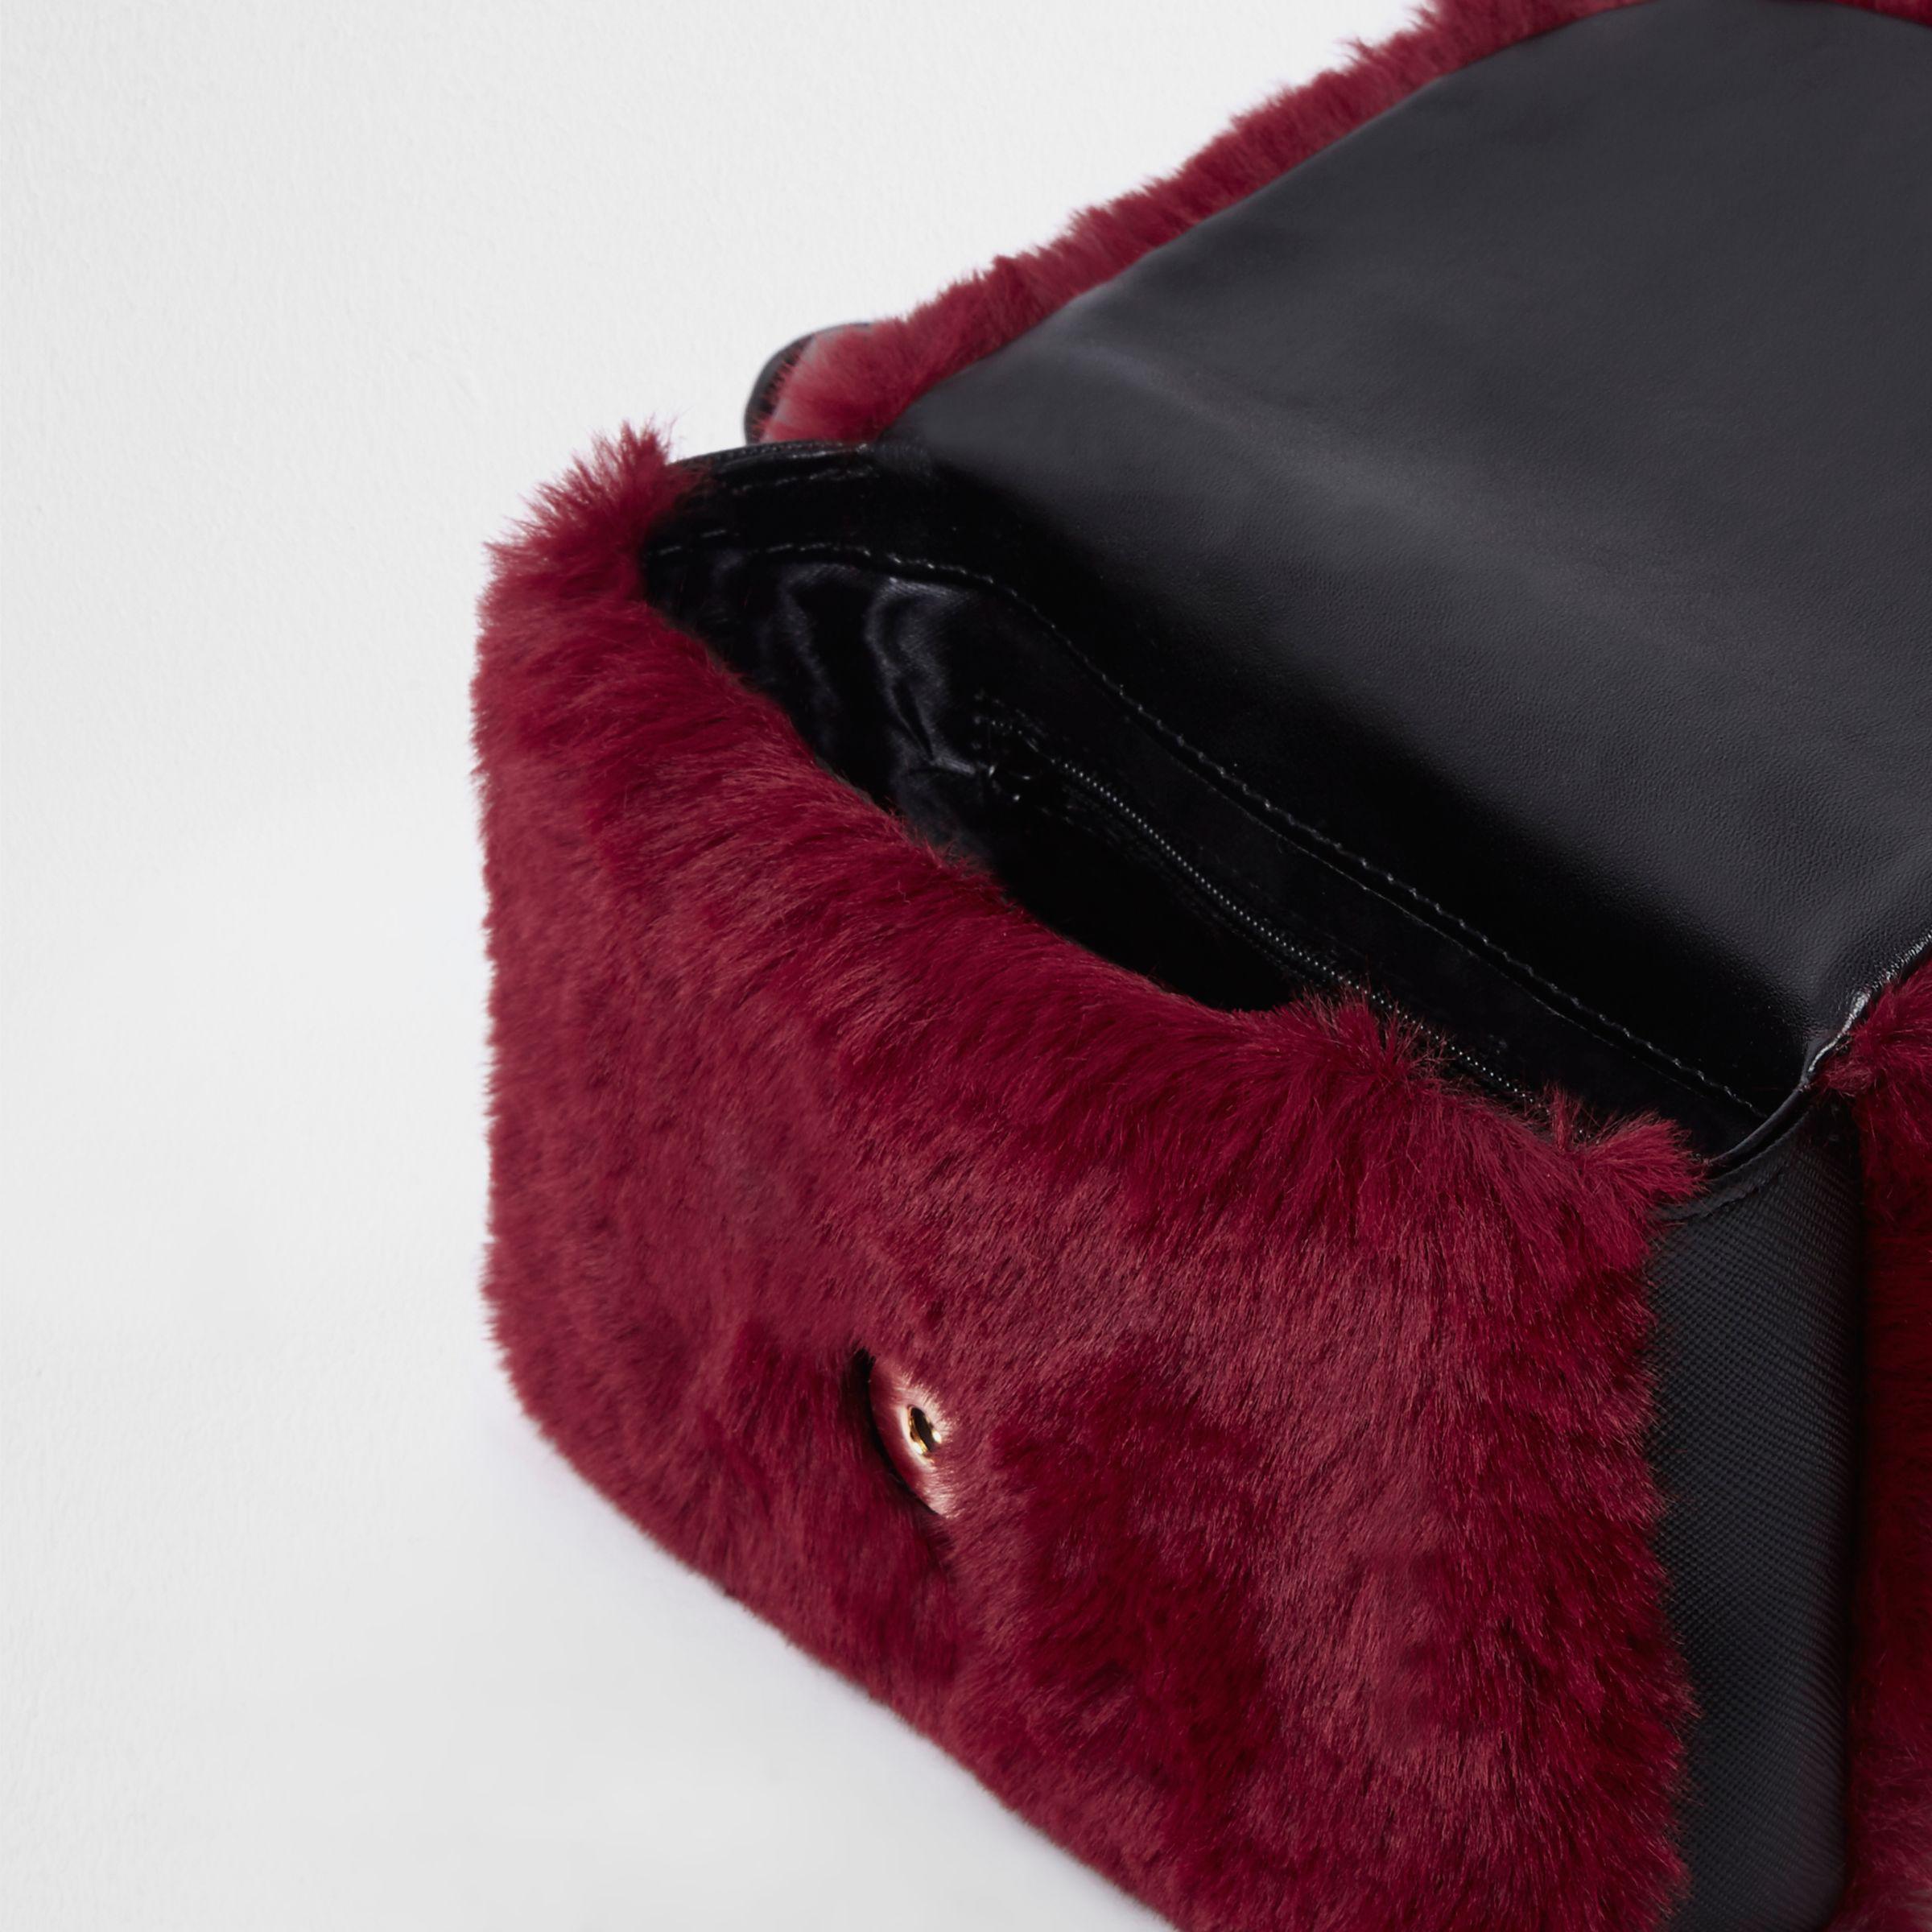 Lyst - River Island Dark Red Faux Fur Buckle Belt Bum Bag in Red 707b371f4a5b5